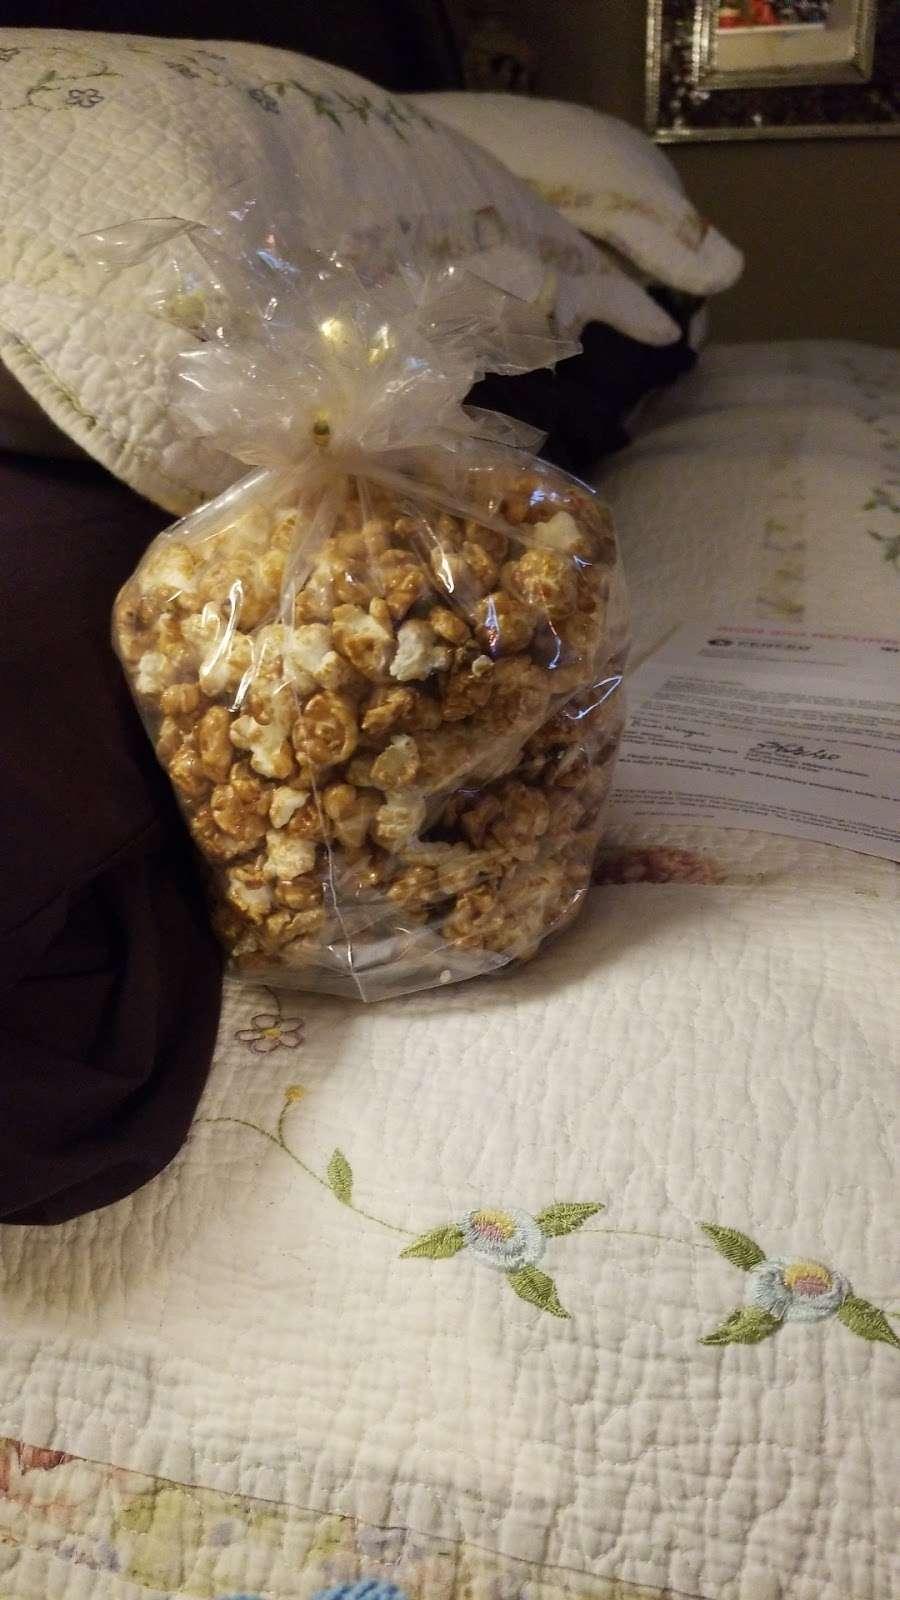 Pops Corn-Free Shipping-100% Guarantee - store  | Photo 9 of 10 | Address: Pembroke Lakes Mall, 11401 Pines Blvd #718, Pembroke Pines, FL 33026, USA | Phone: (954) 349-3499